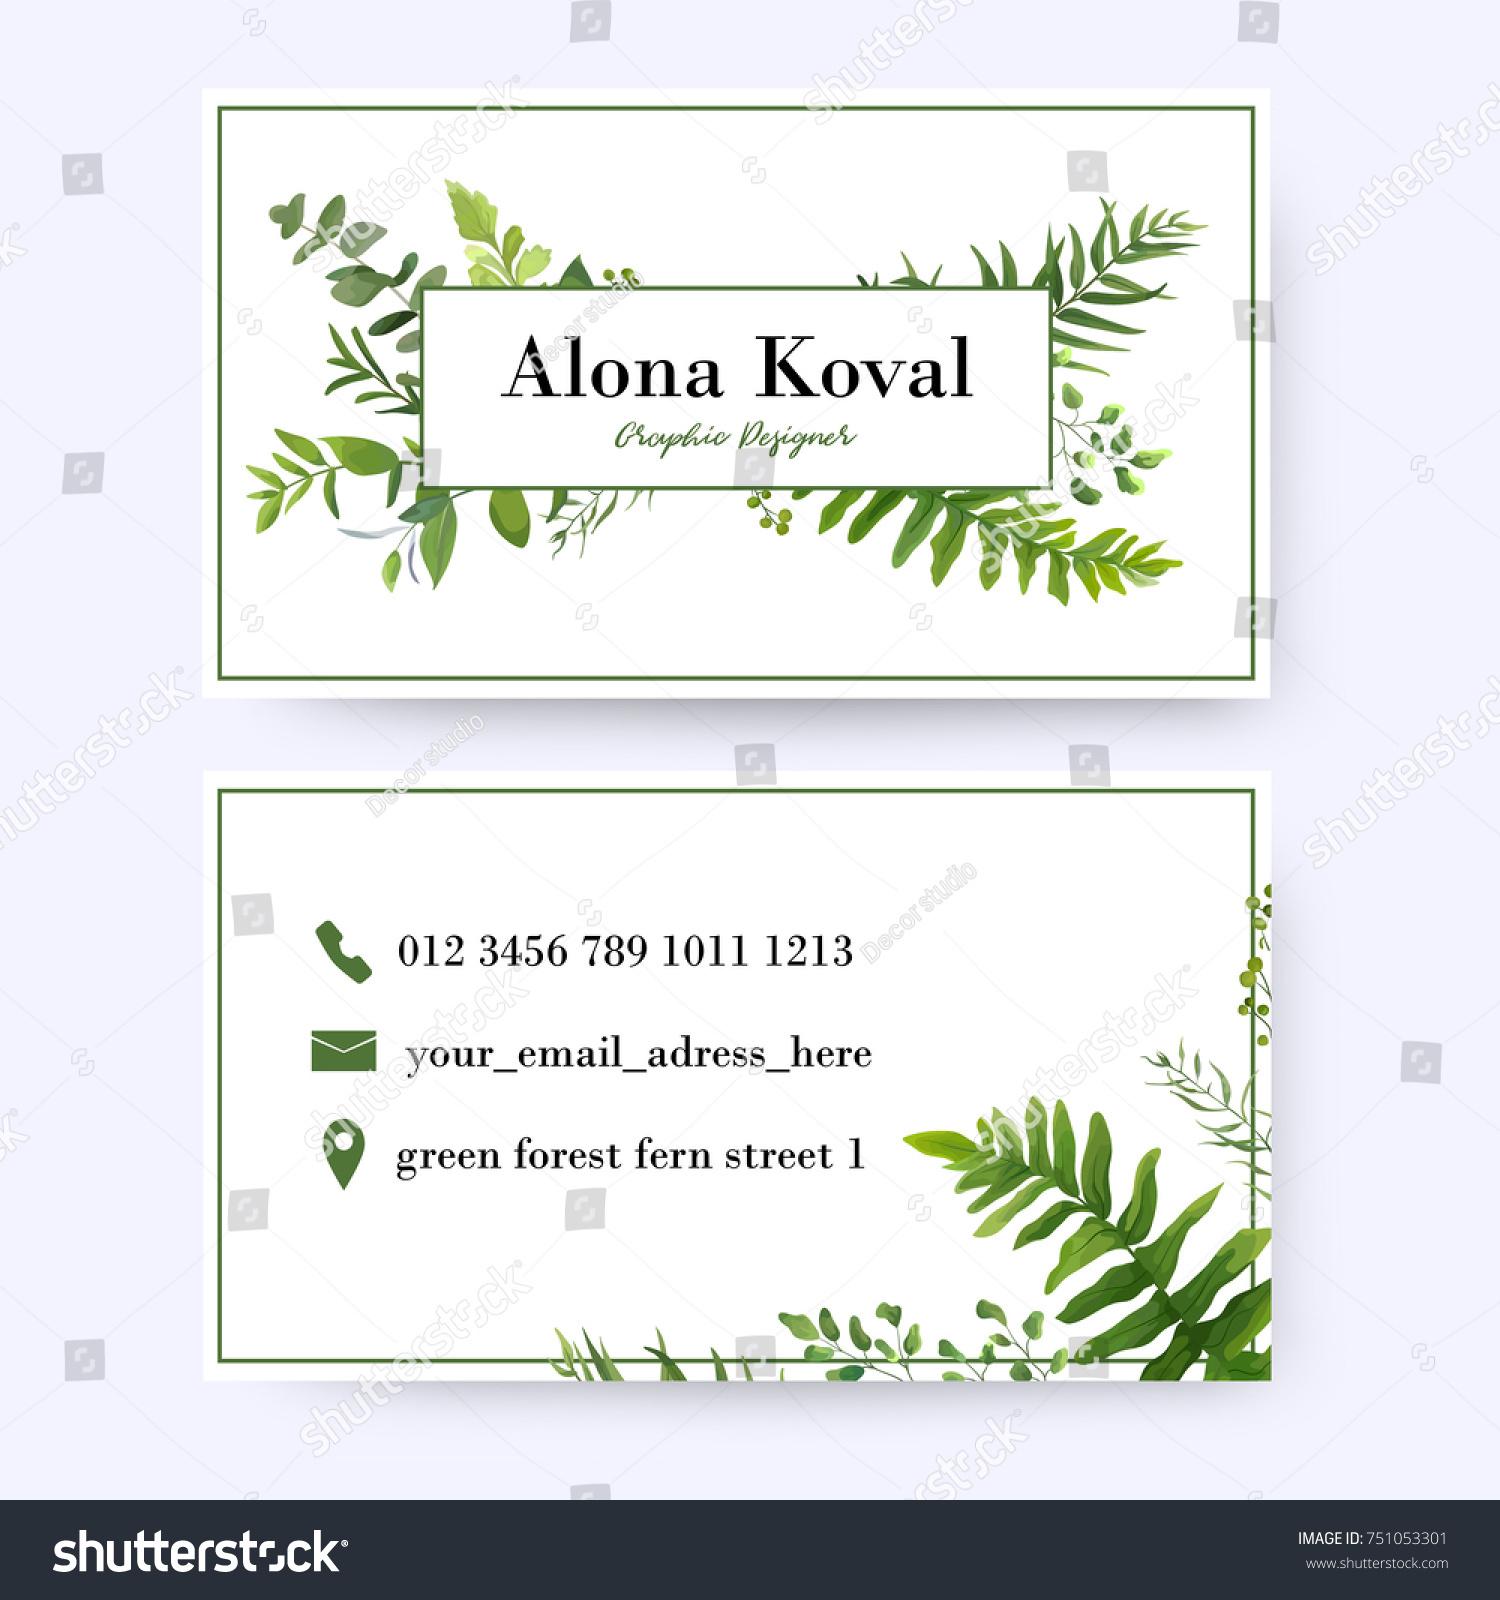 Floral Business Card Design Vintage Rustic Stock Vector 751053301 ...